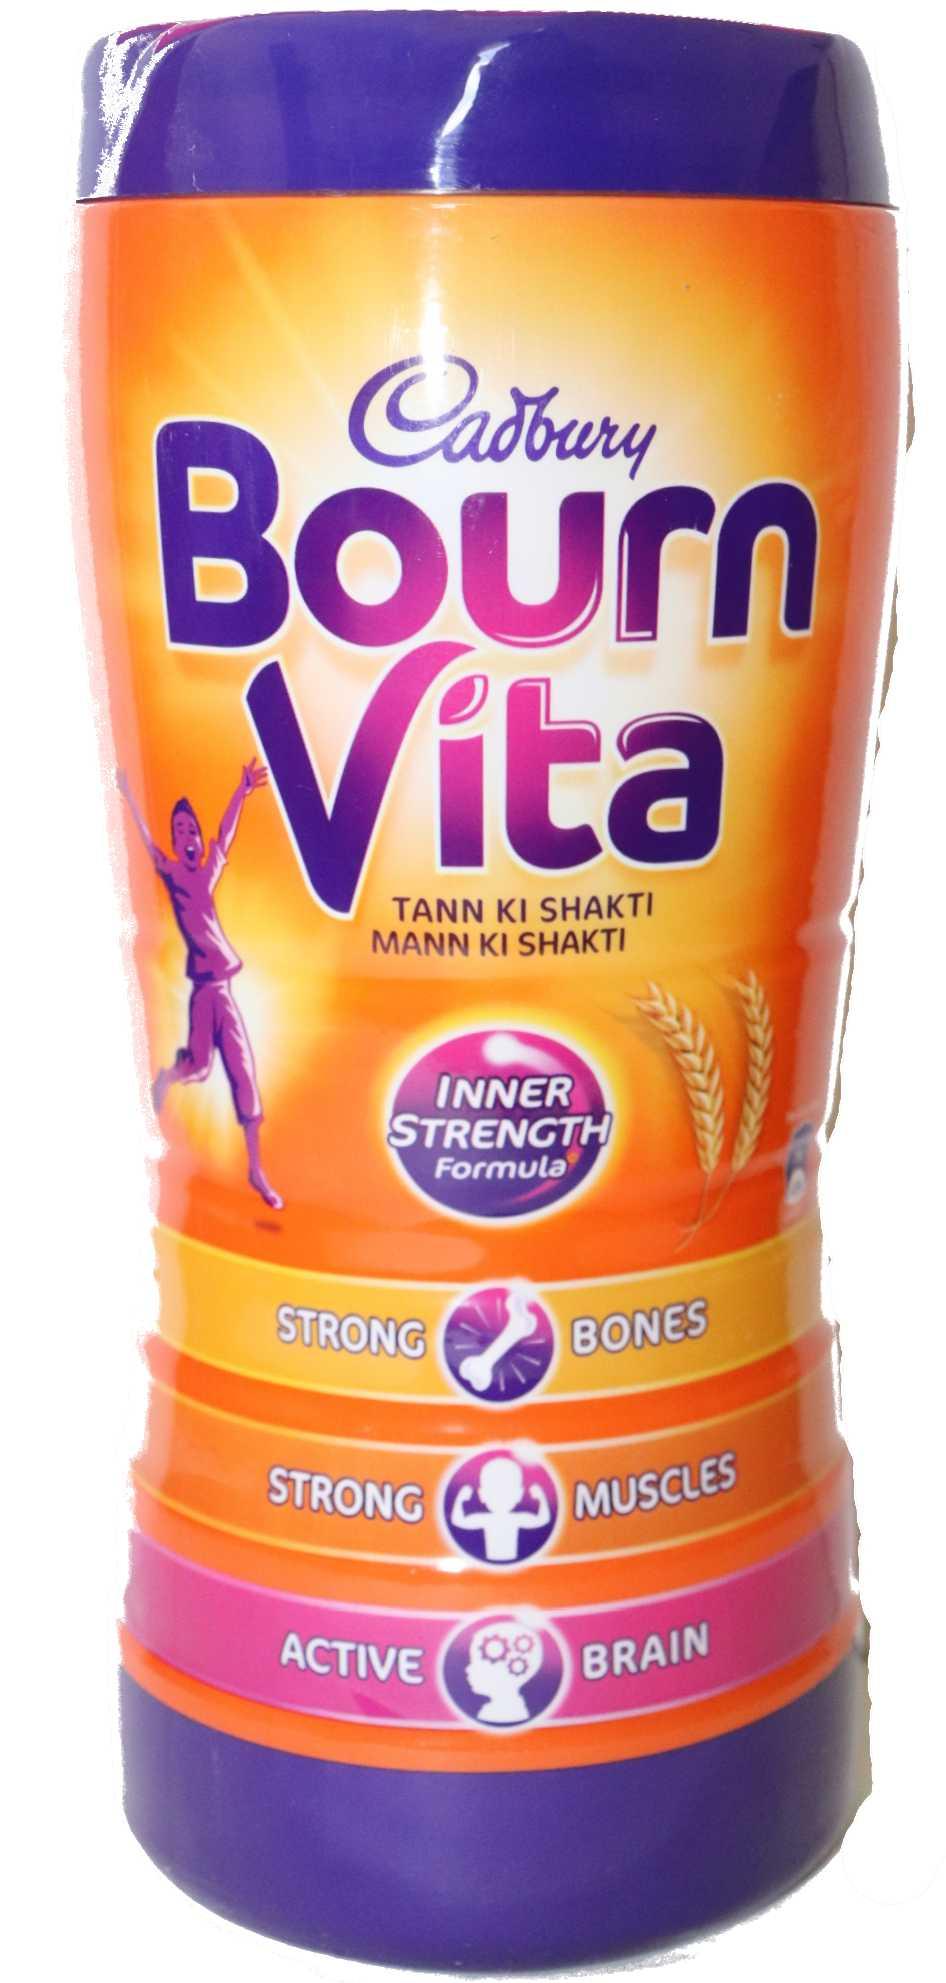 Cadbury Bourn Vita 1kg